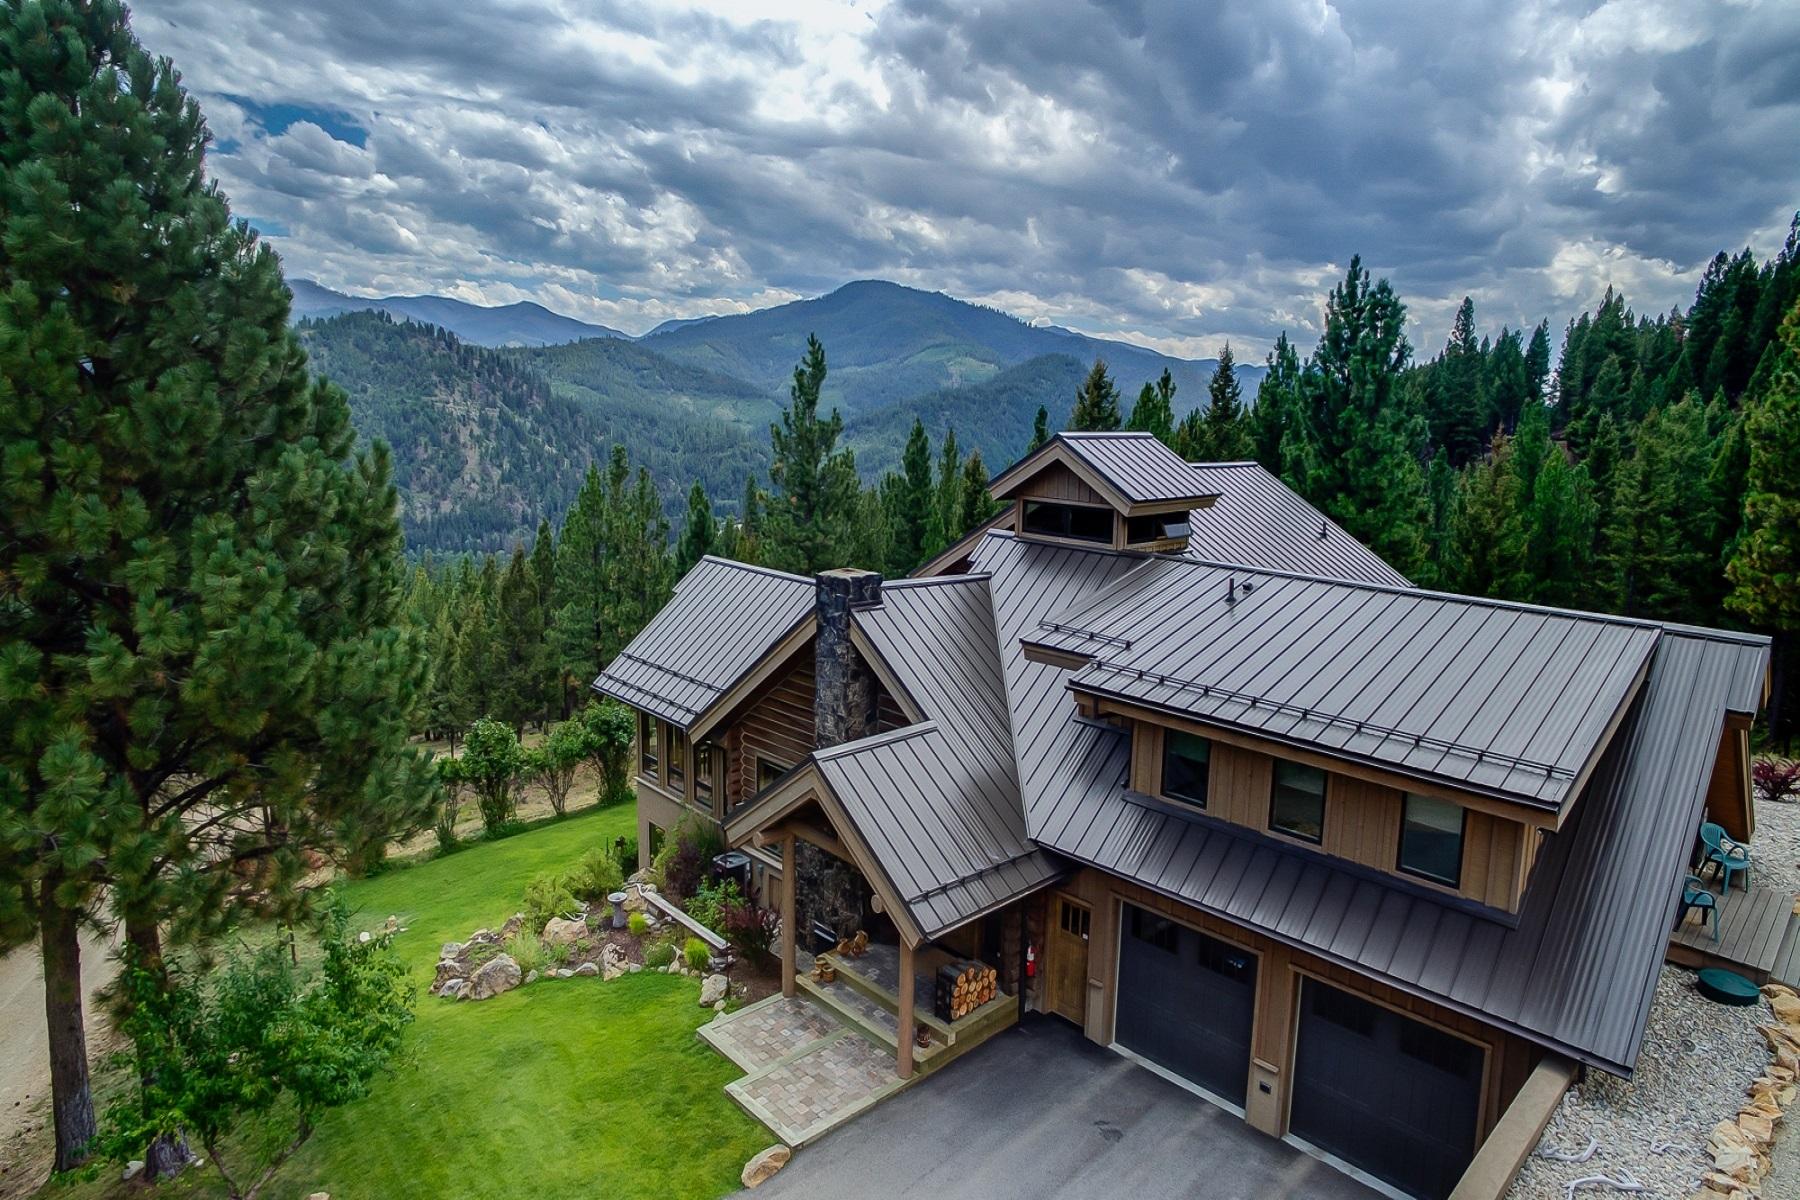 Single Family Home for Sale at 251 Kucera 251 Kucera Road Darby, Montana, 59829 United States